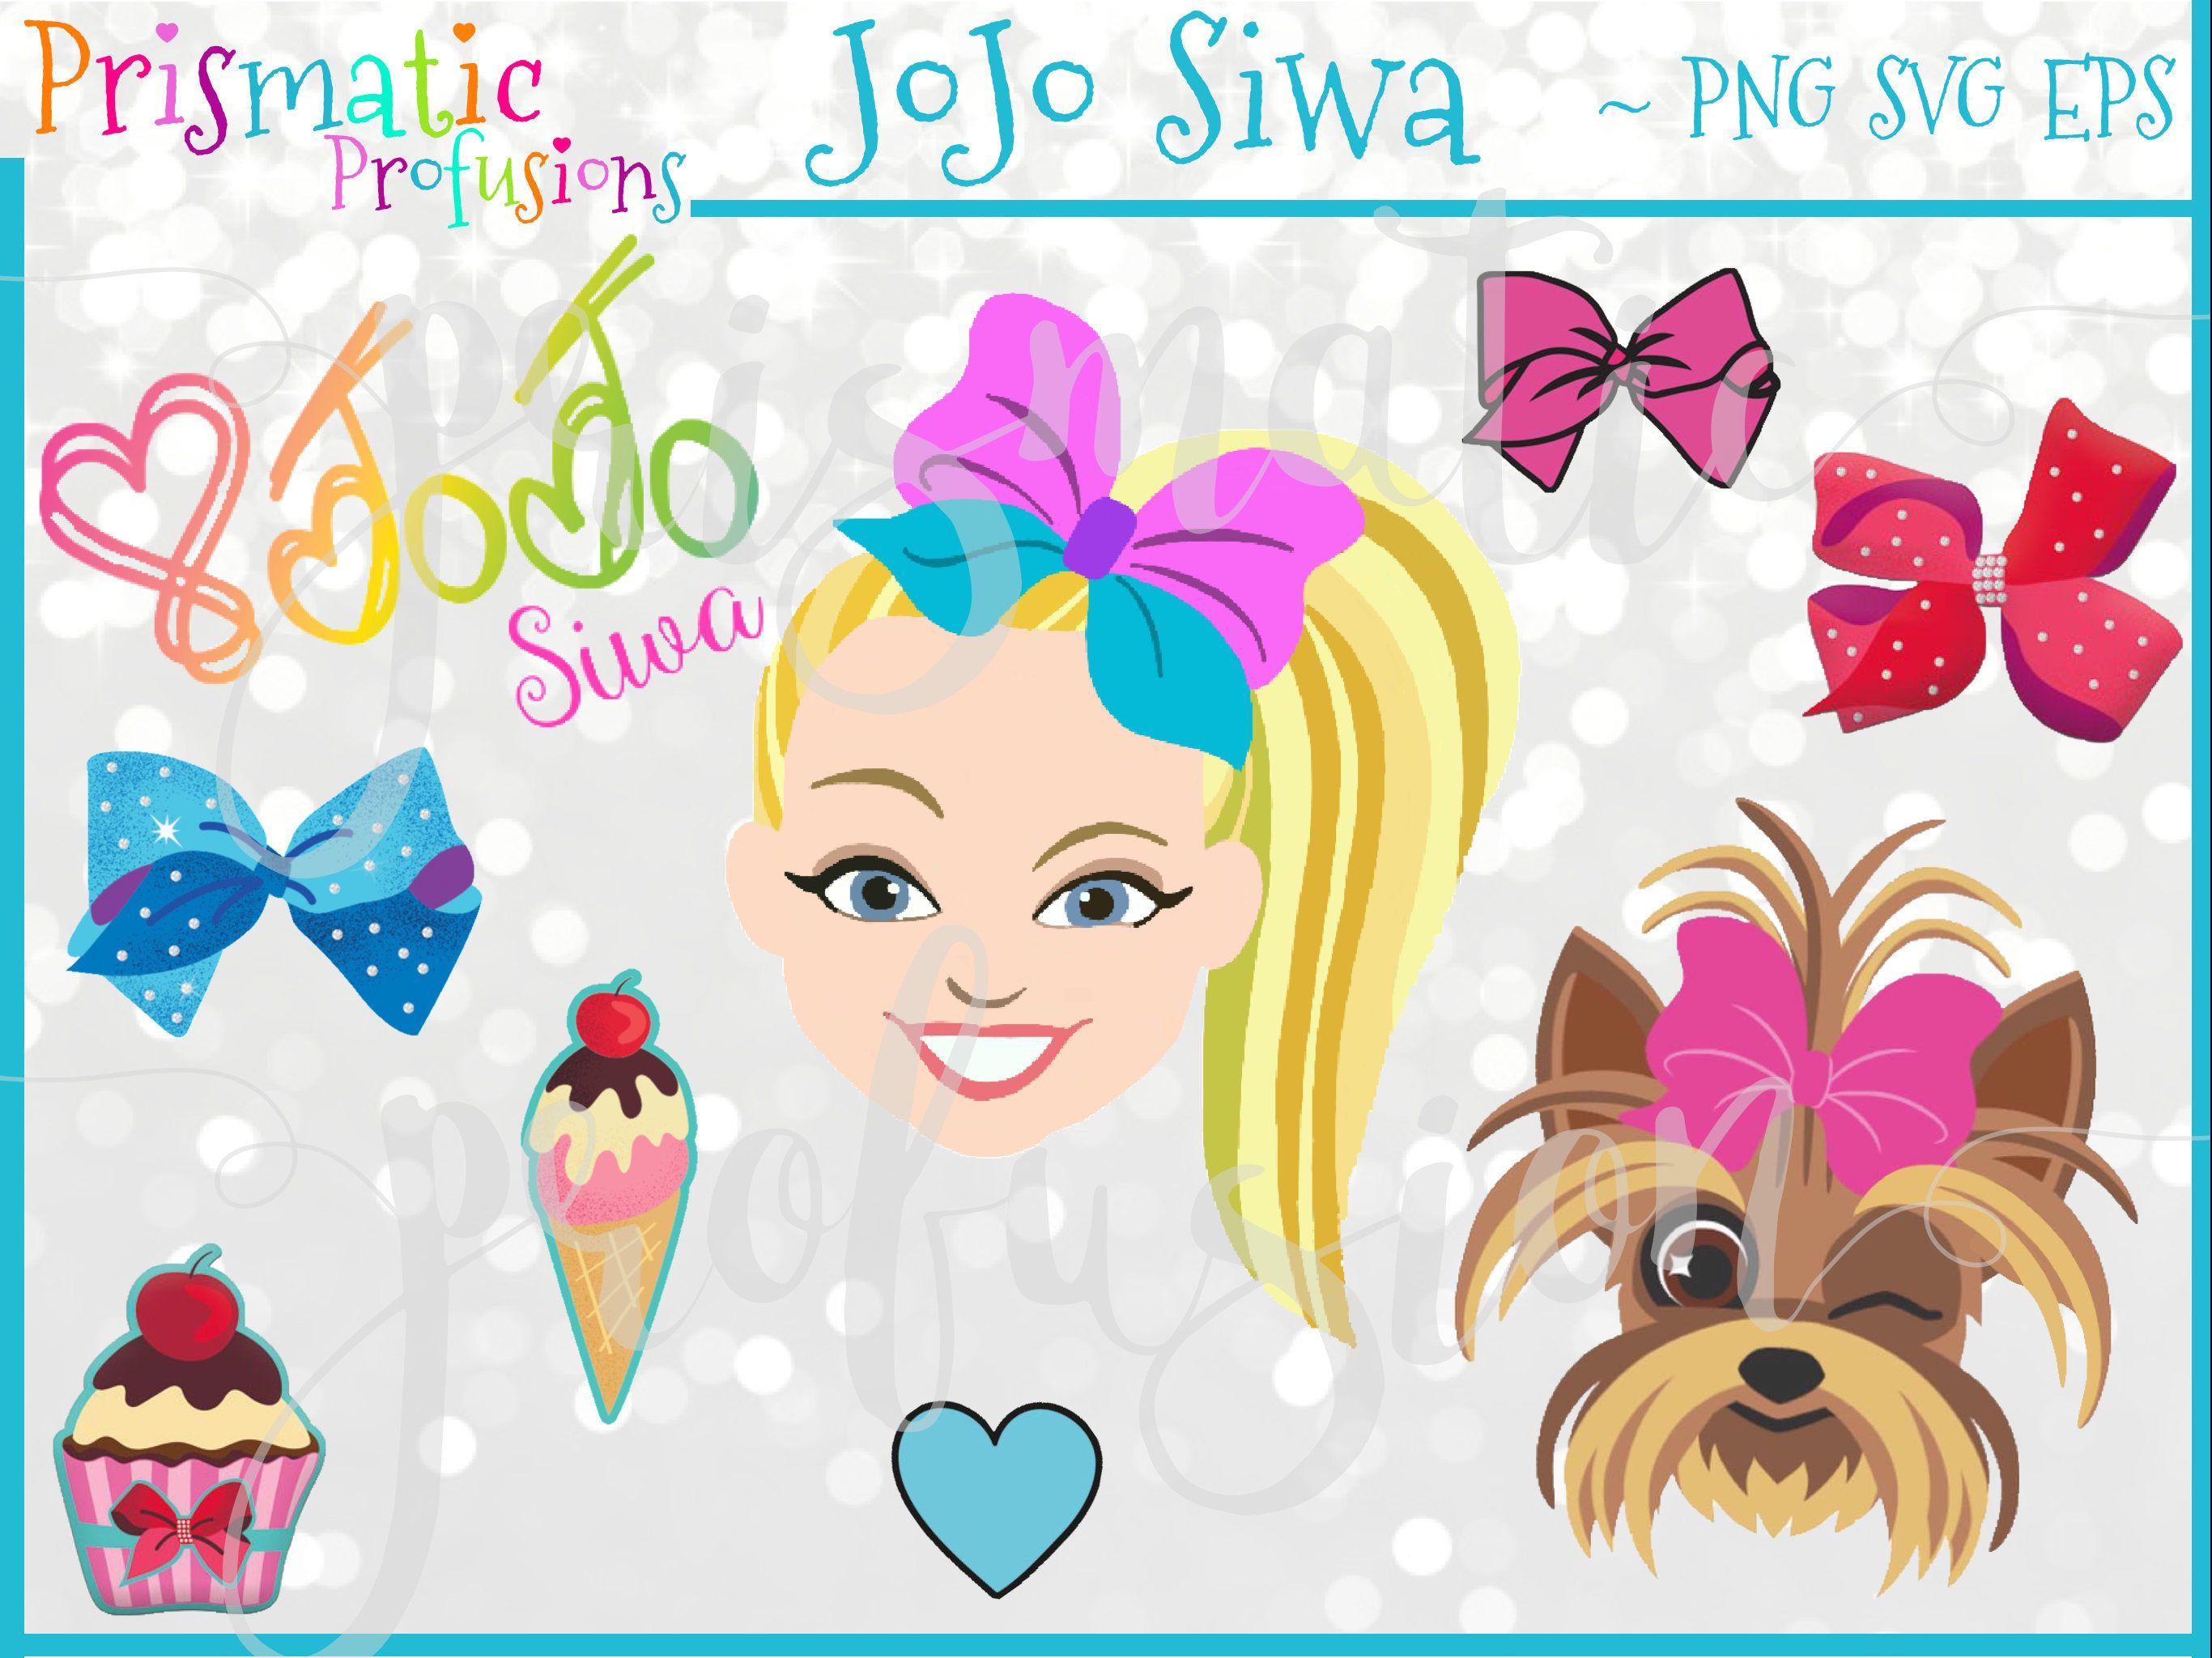 Jojo Siwa Image Clipart Diy Modern Printable Digital File Png Svg Eps Pdf Stickers Inst Jojo Siwa Birthday Free Birthday Printables Jojo Bows